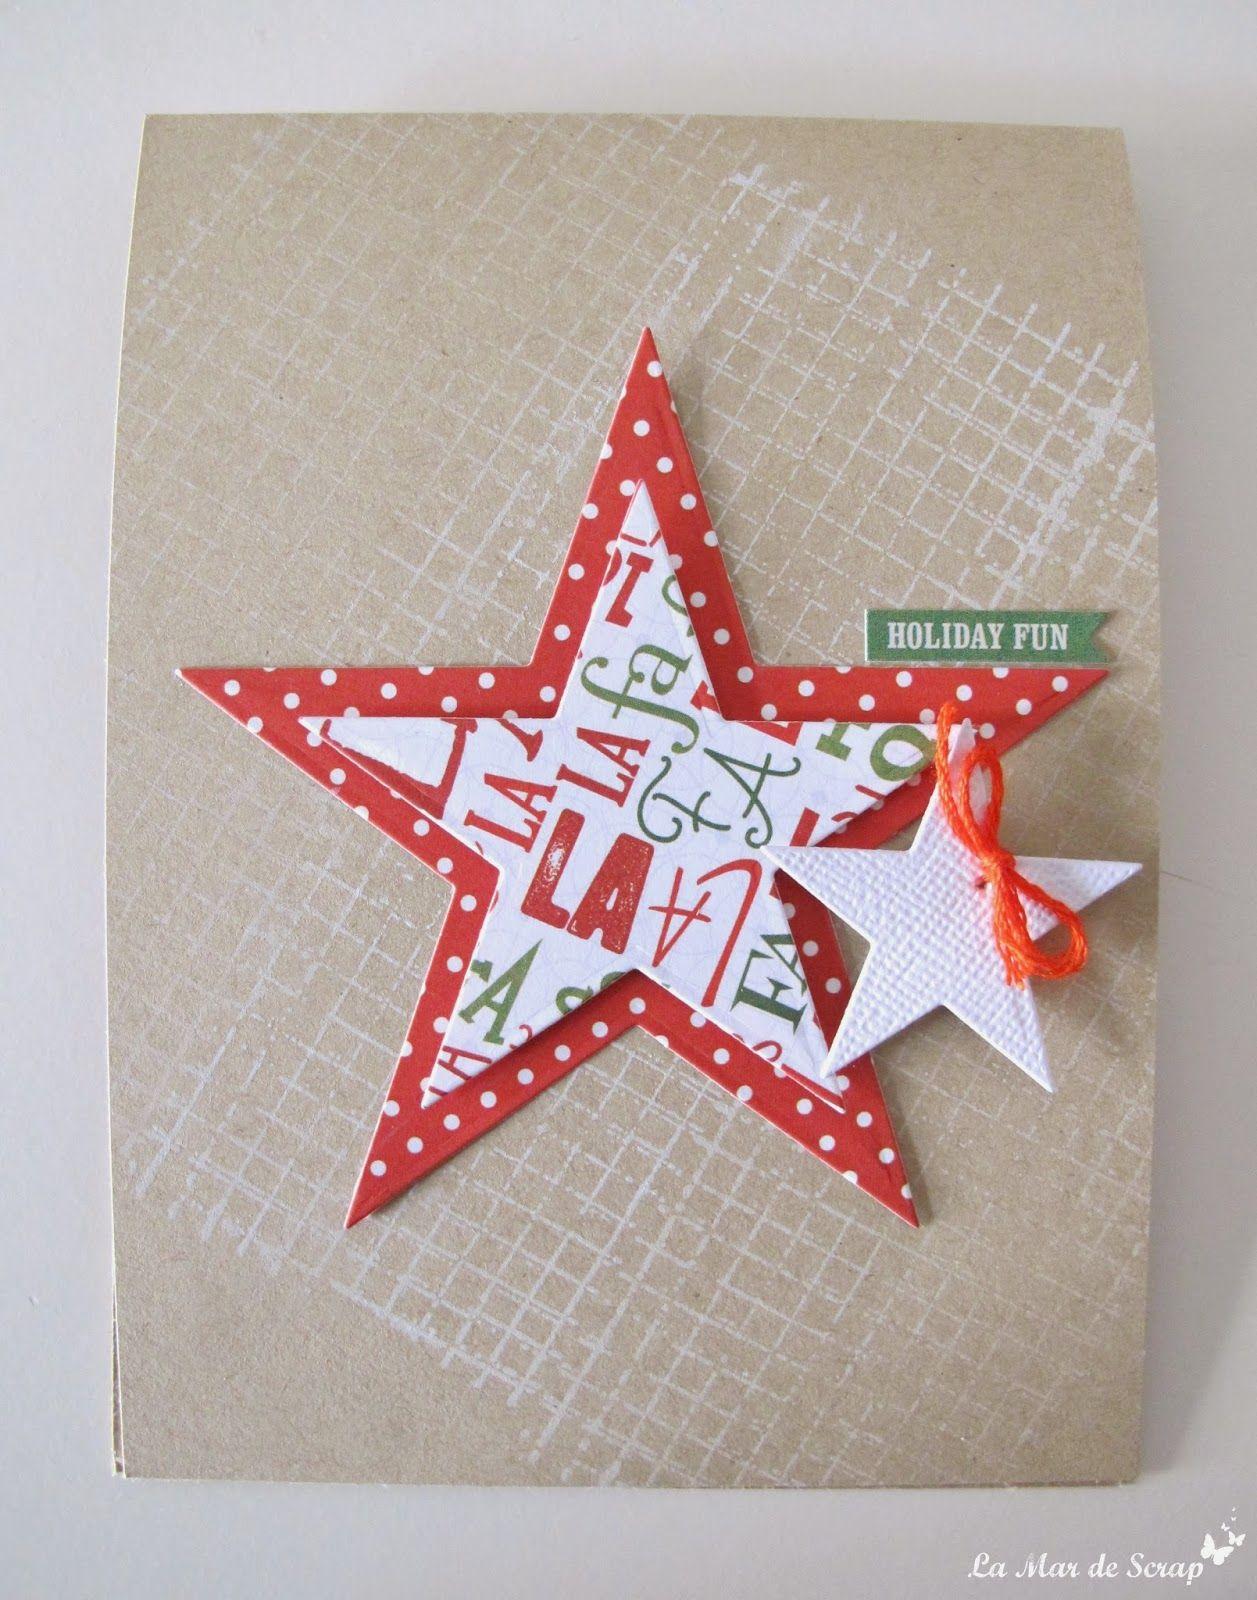 La mar de scrap tercer reto kits de somni postales - Postales navidenas originales ...